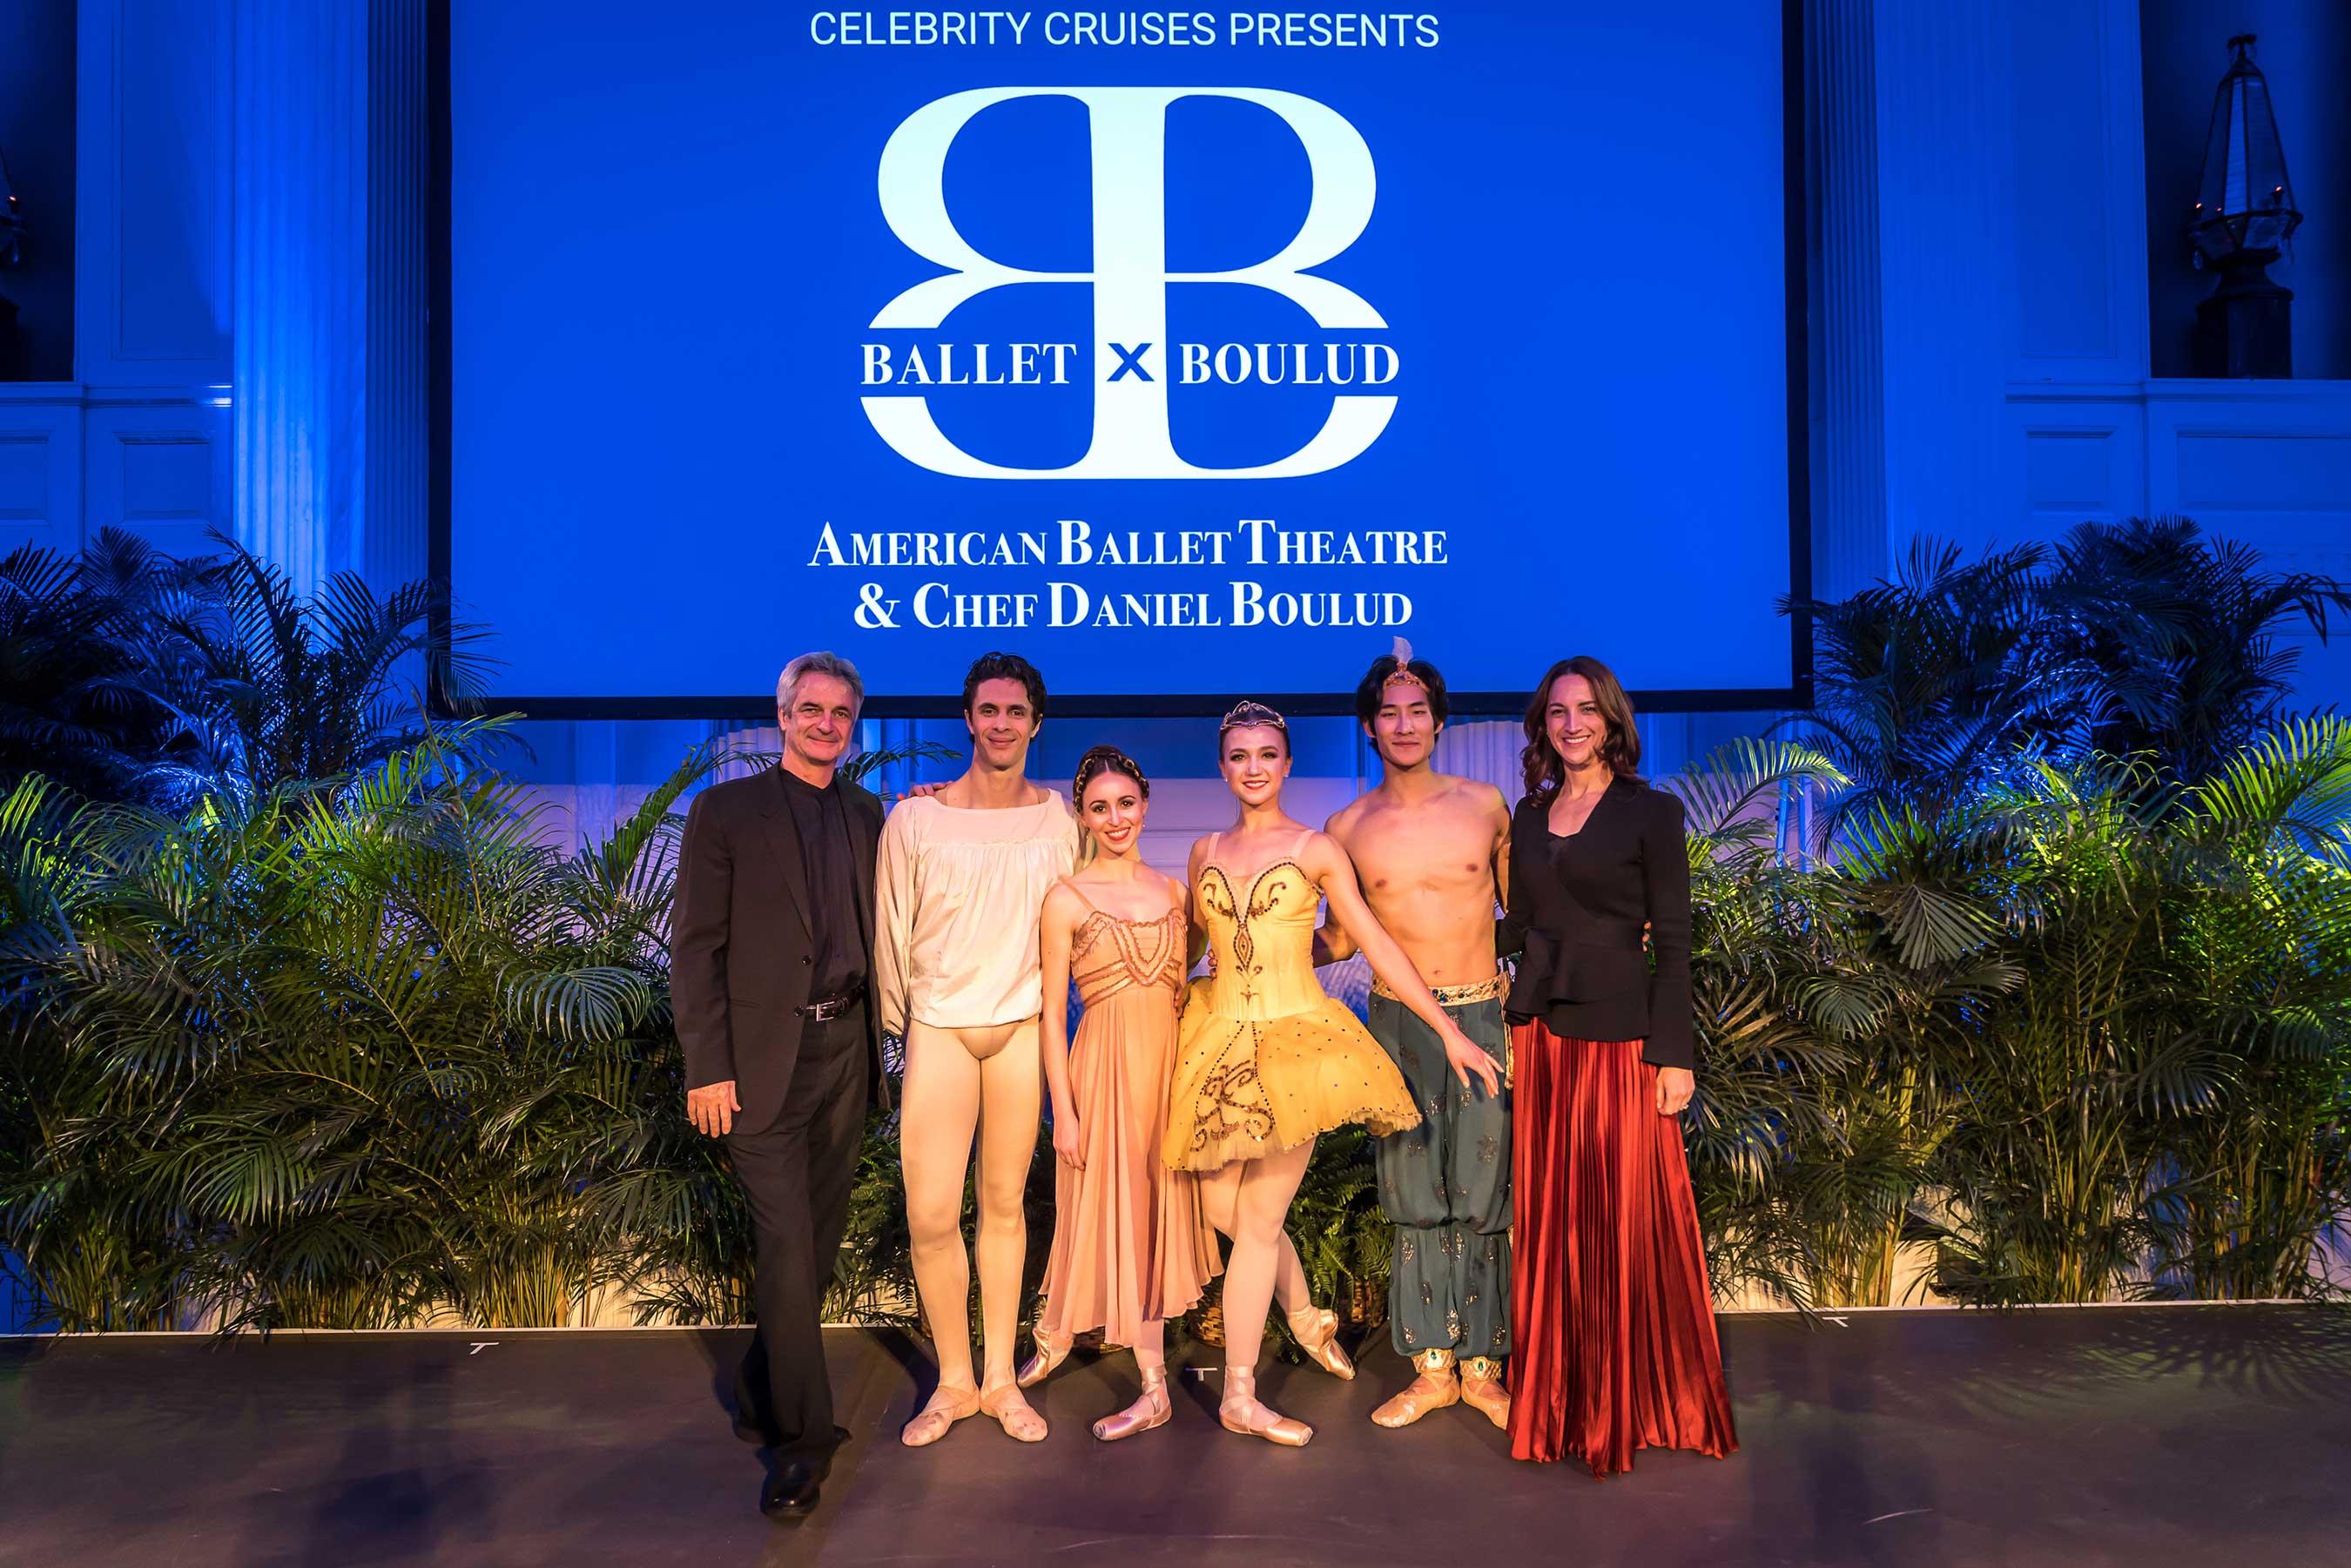 Left to Right: American Ballet Theatres Artistic Director, Kevin McKenzie, Soloists Skylar Brandt, Alexandre Hammoudi, Katherine Williams, Joo Won Ahn and Executive Director Kara Barnett